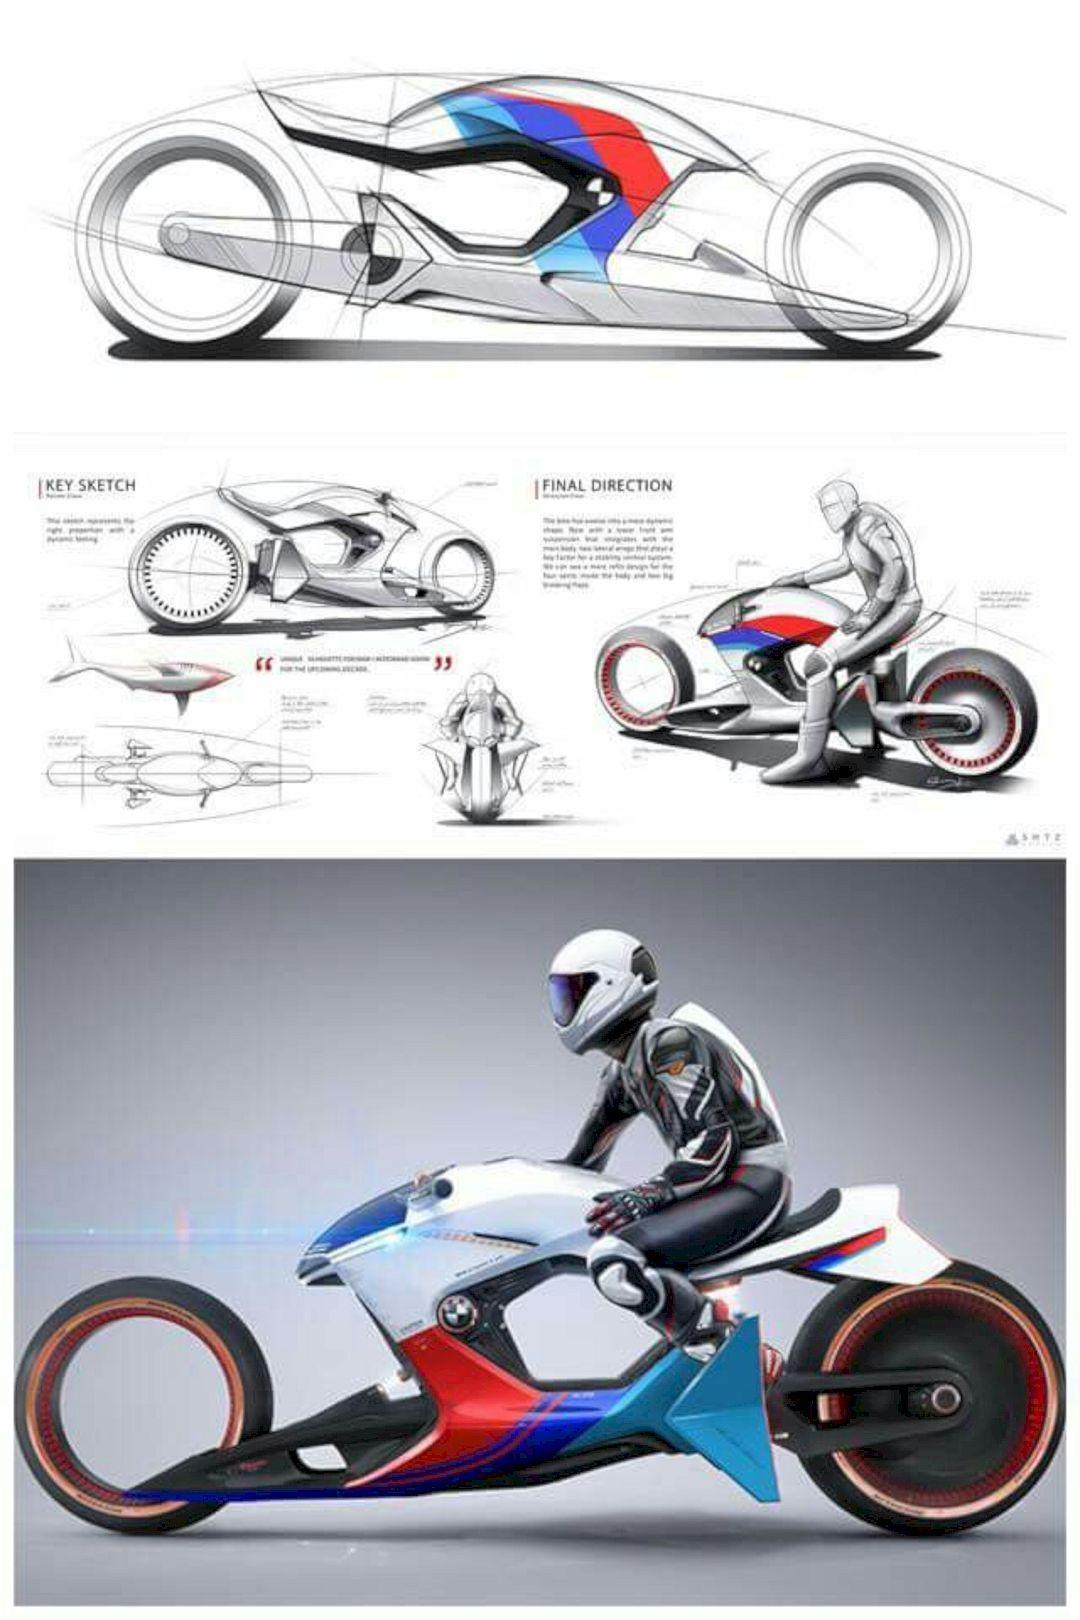 Ural Motorcycle From Russia With Love Inspired By The Elegance And Sophistication Of The Ultimate Espion 2020 Bisikletcilik Hayalinizdeki Arabalar Konsept Arabalar